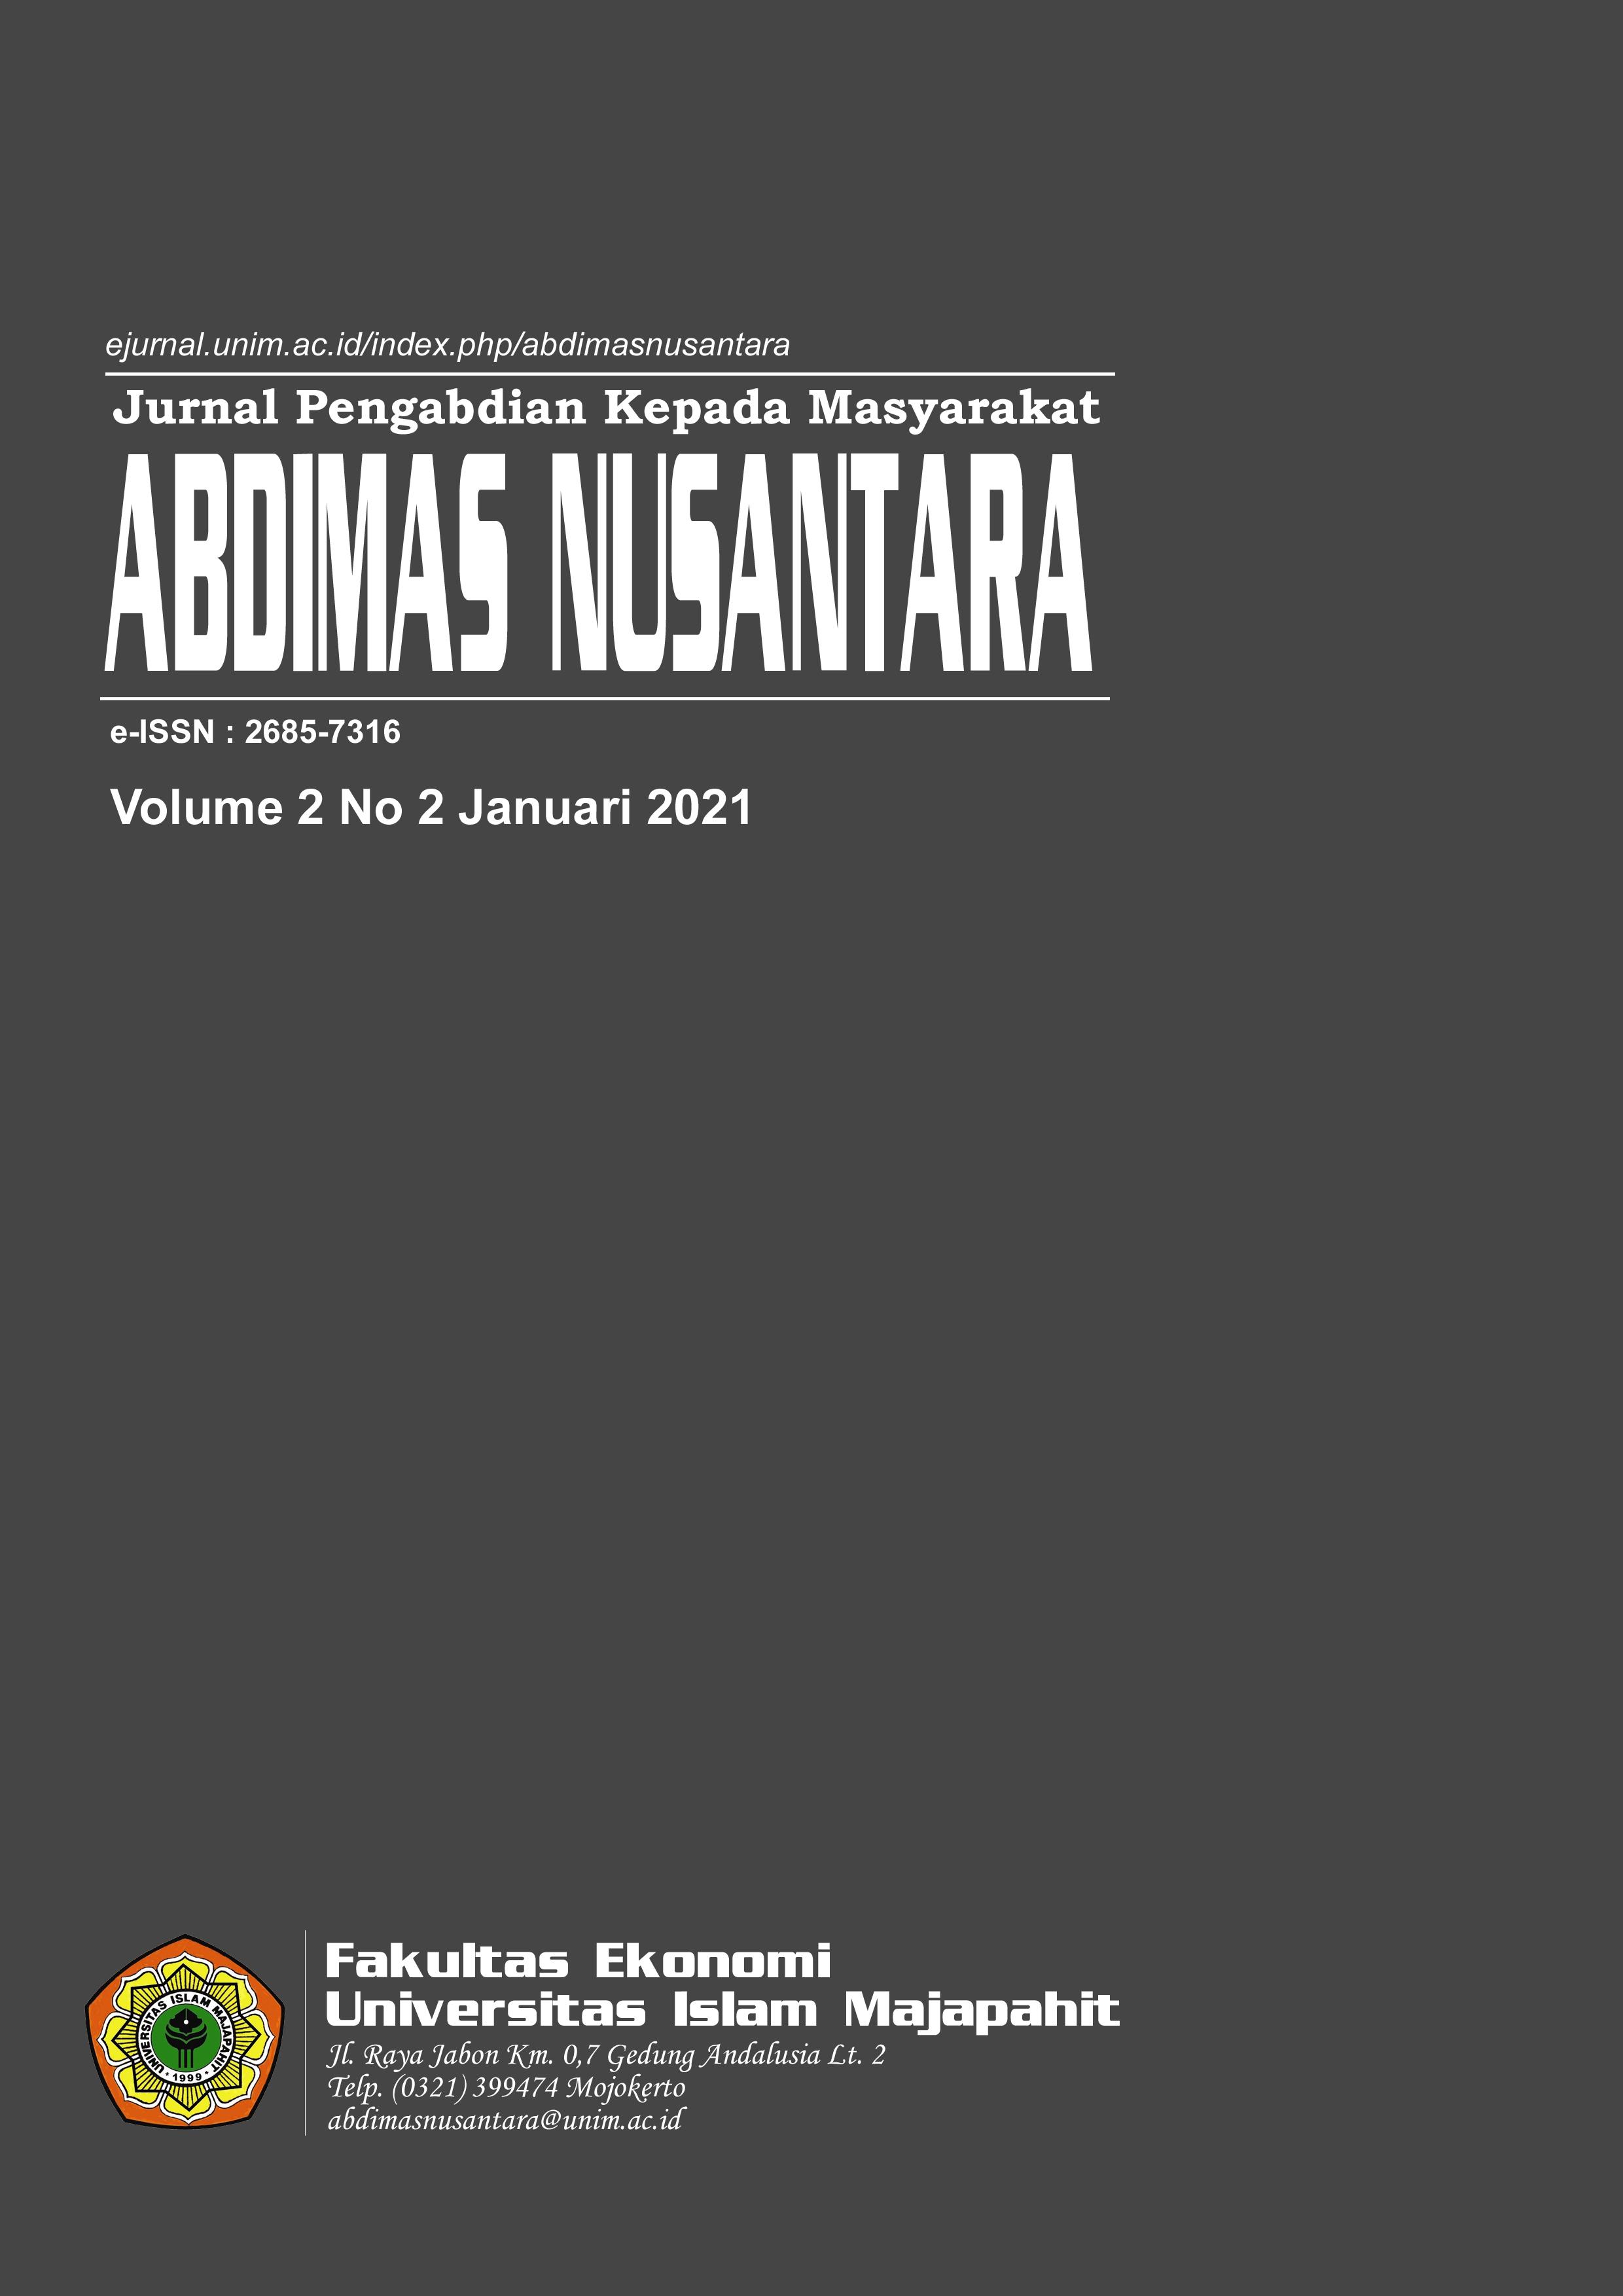 View Vol. 2 No. 2 (2021): ABDIMAS NUSANTARA (Januari)